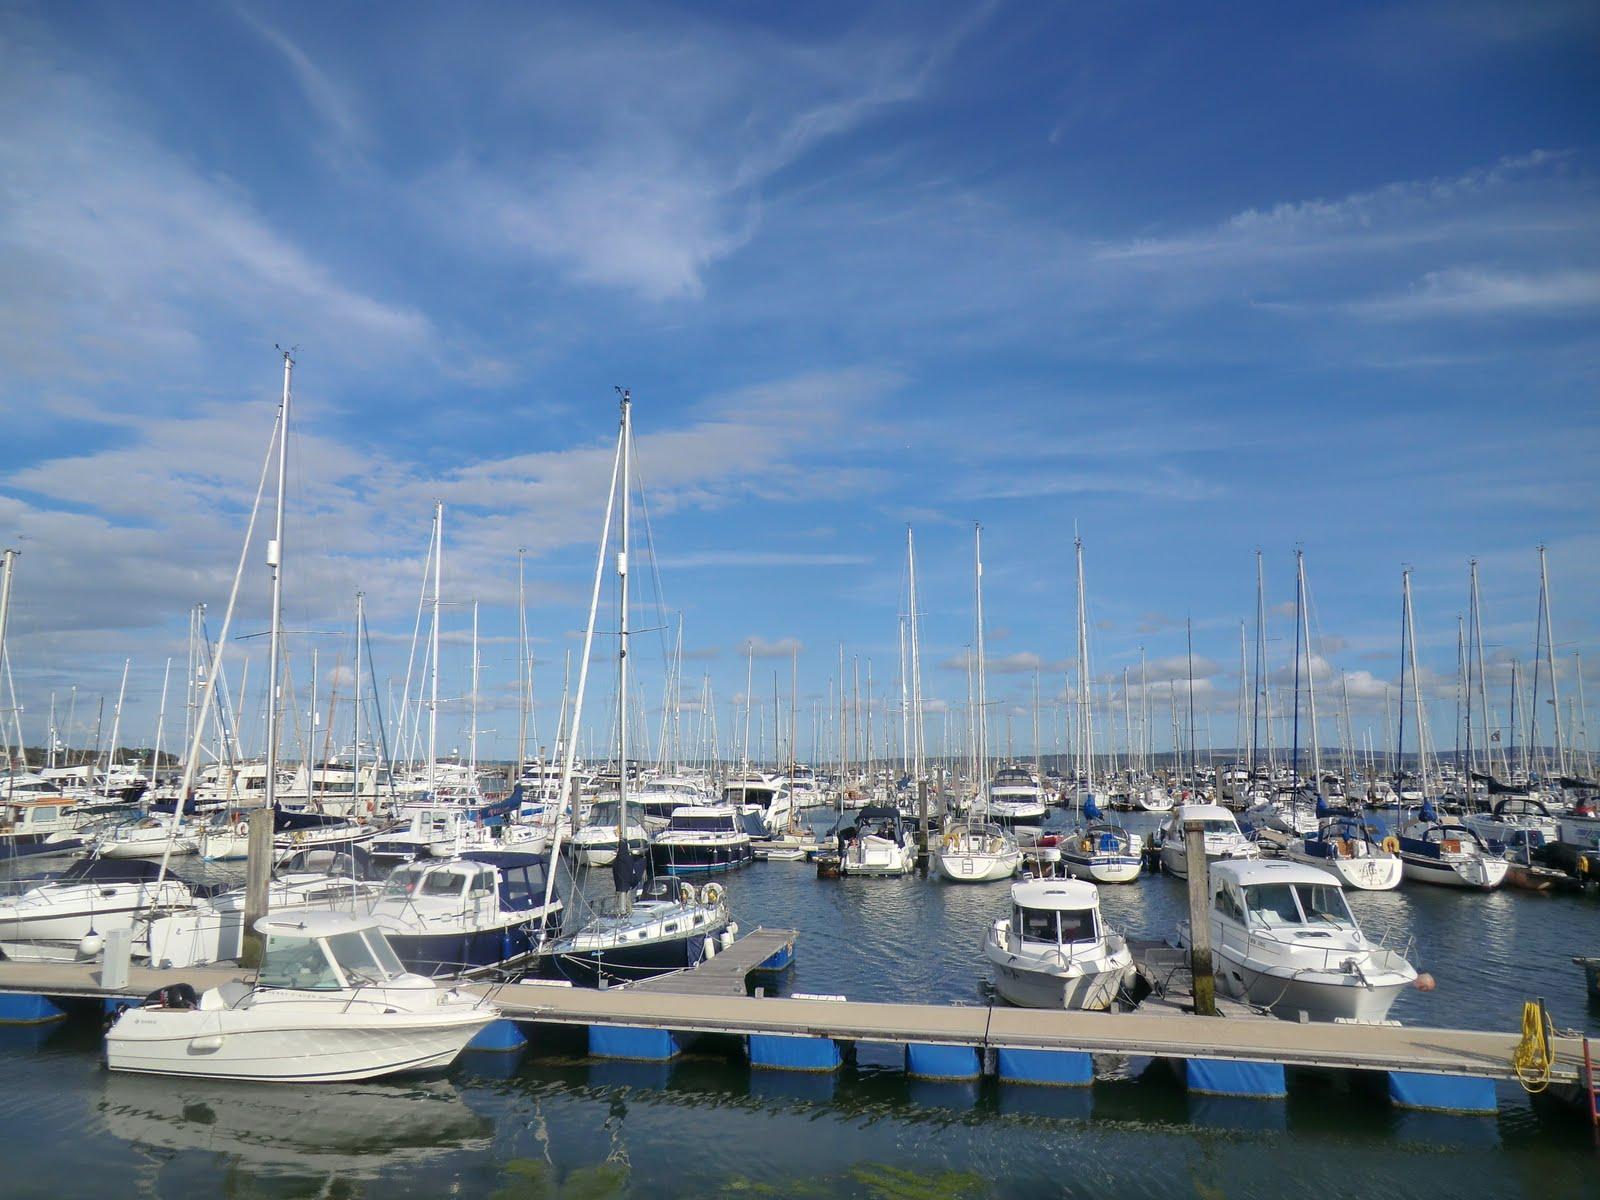 CIMG4507 Lymington Yacht Haven